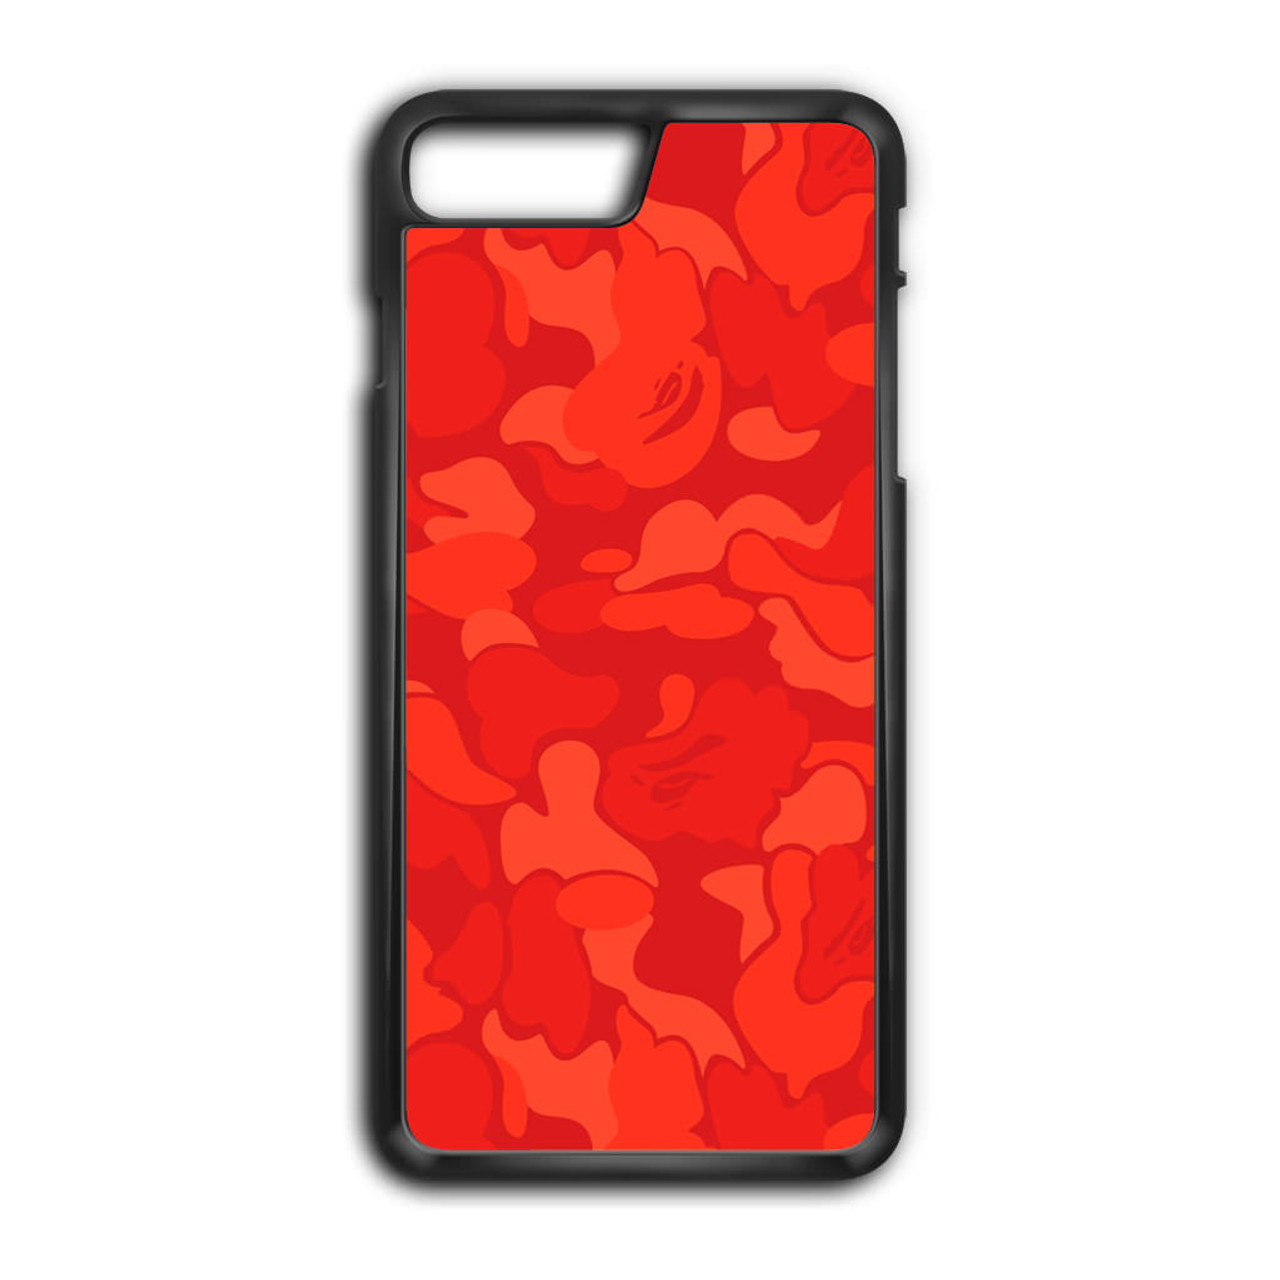 online retailer 8c066 c5a49 Bape Camo Red iPhone 7 Plus Case